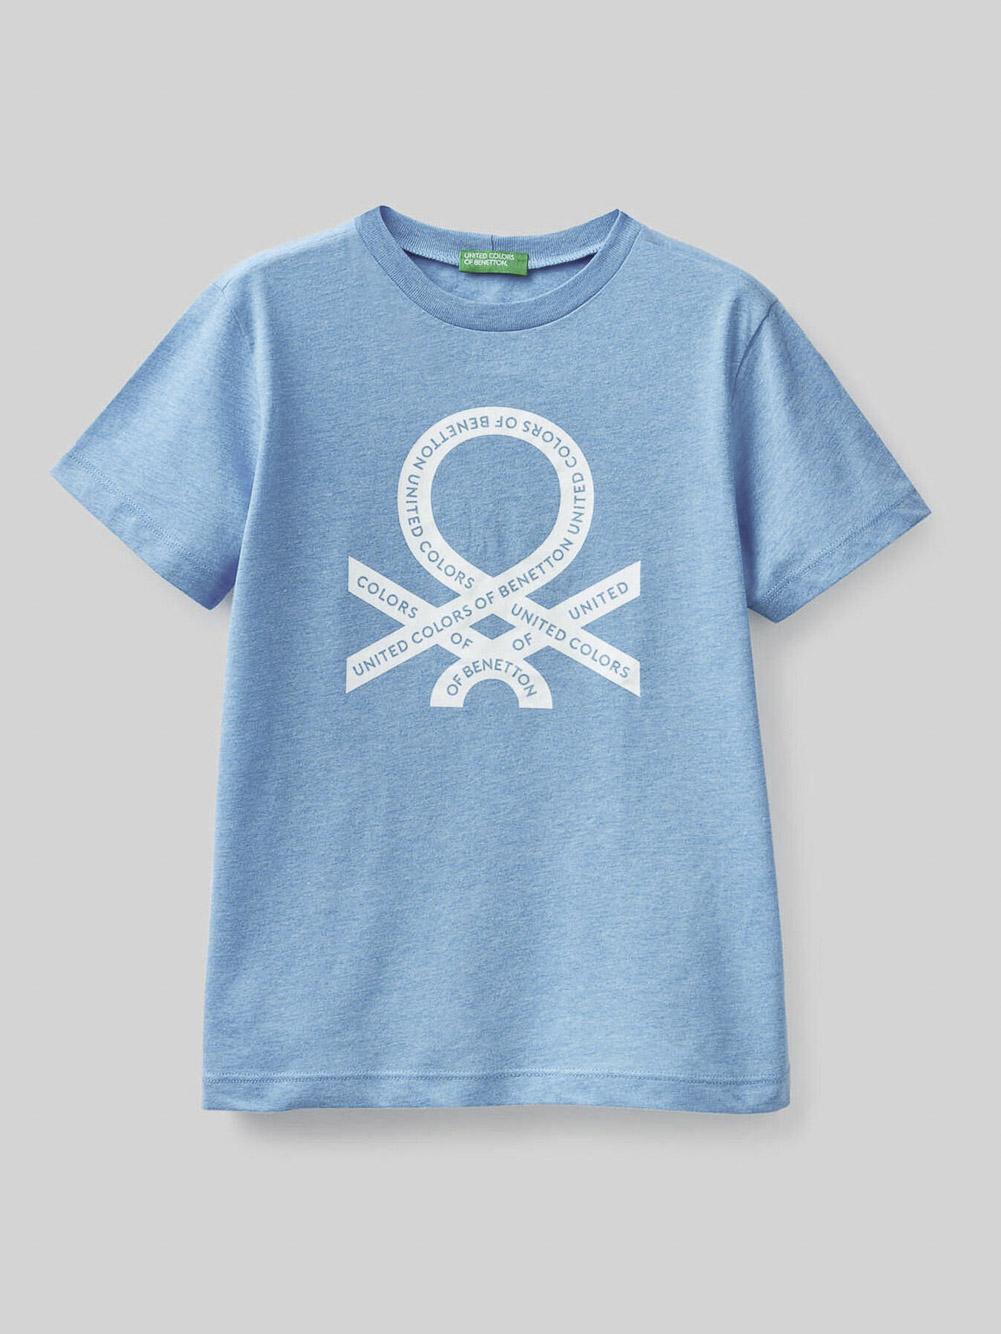 012 BENETTON Μπλούζα t-shirt 3U29C14IT 20P90P